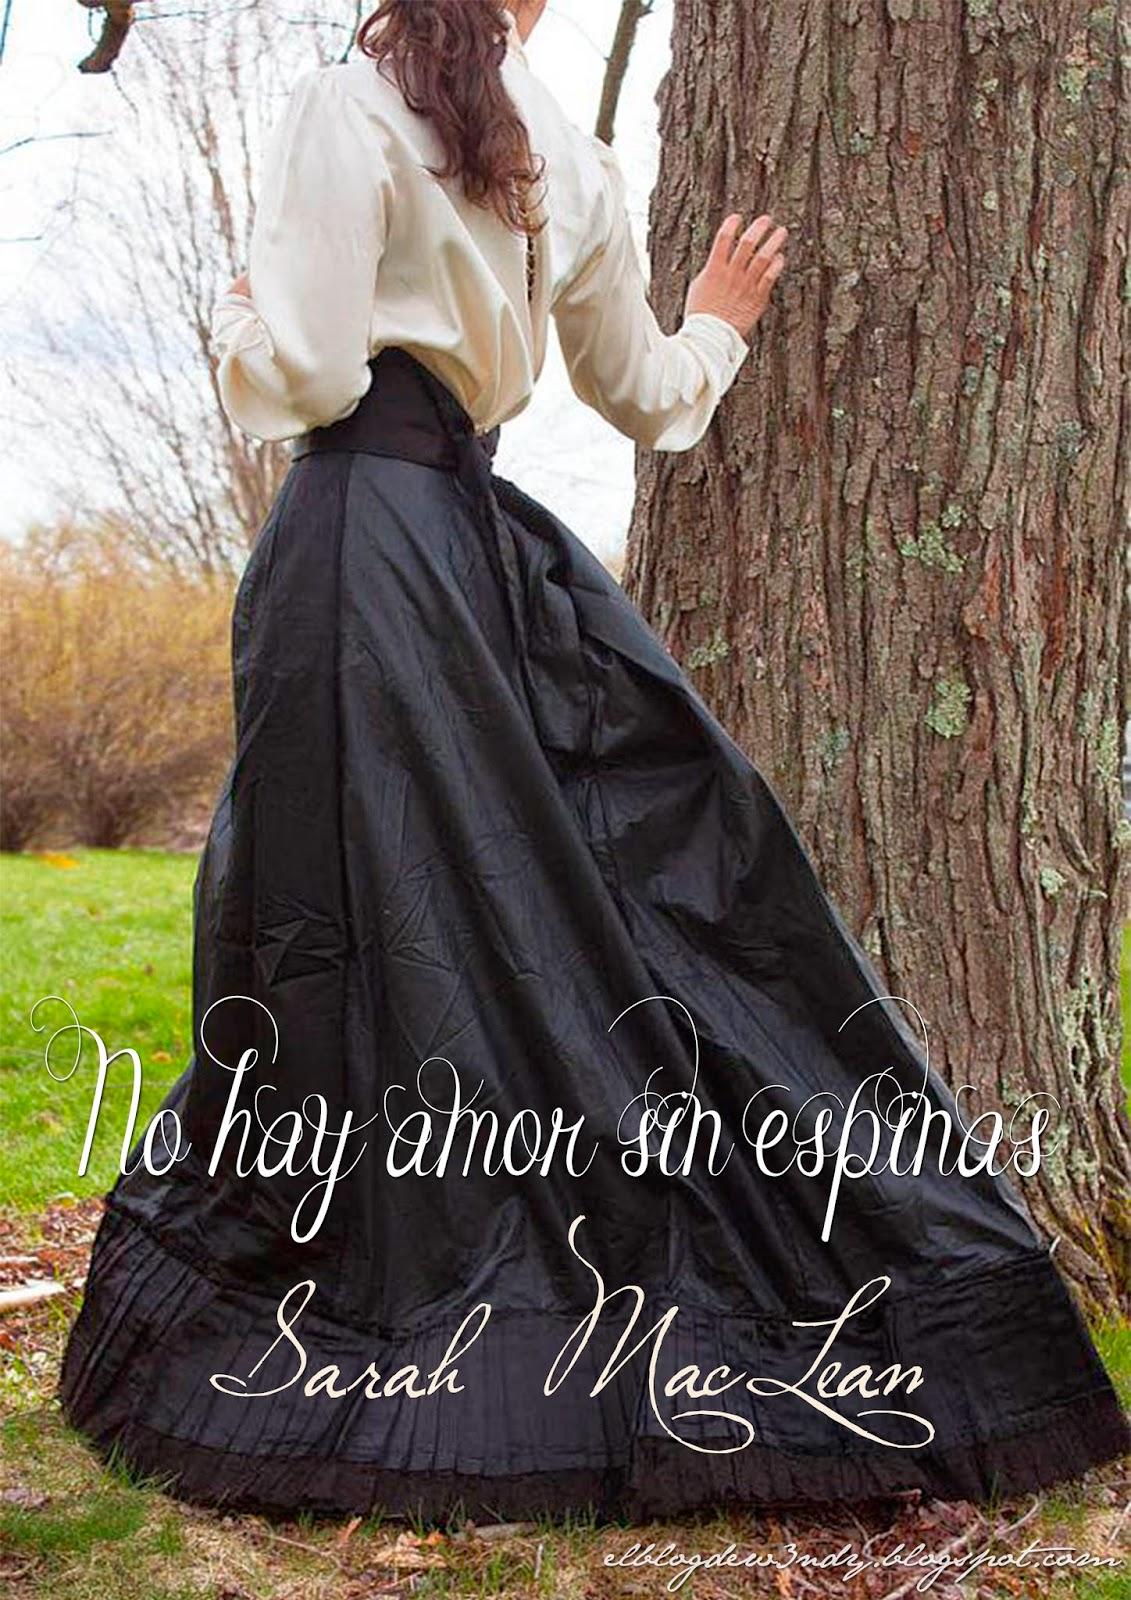 http://elblogdew3ndy.blogspot.com/2015/03/resena-no-hay-amor-sin-espinas-sarah.html